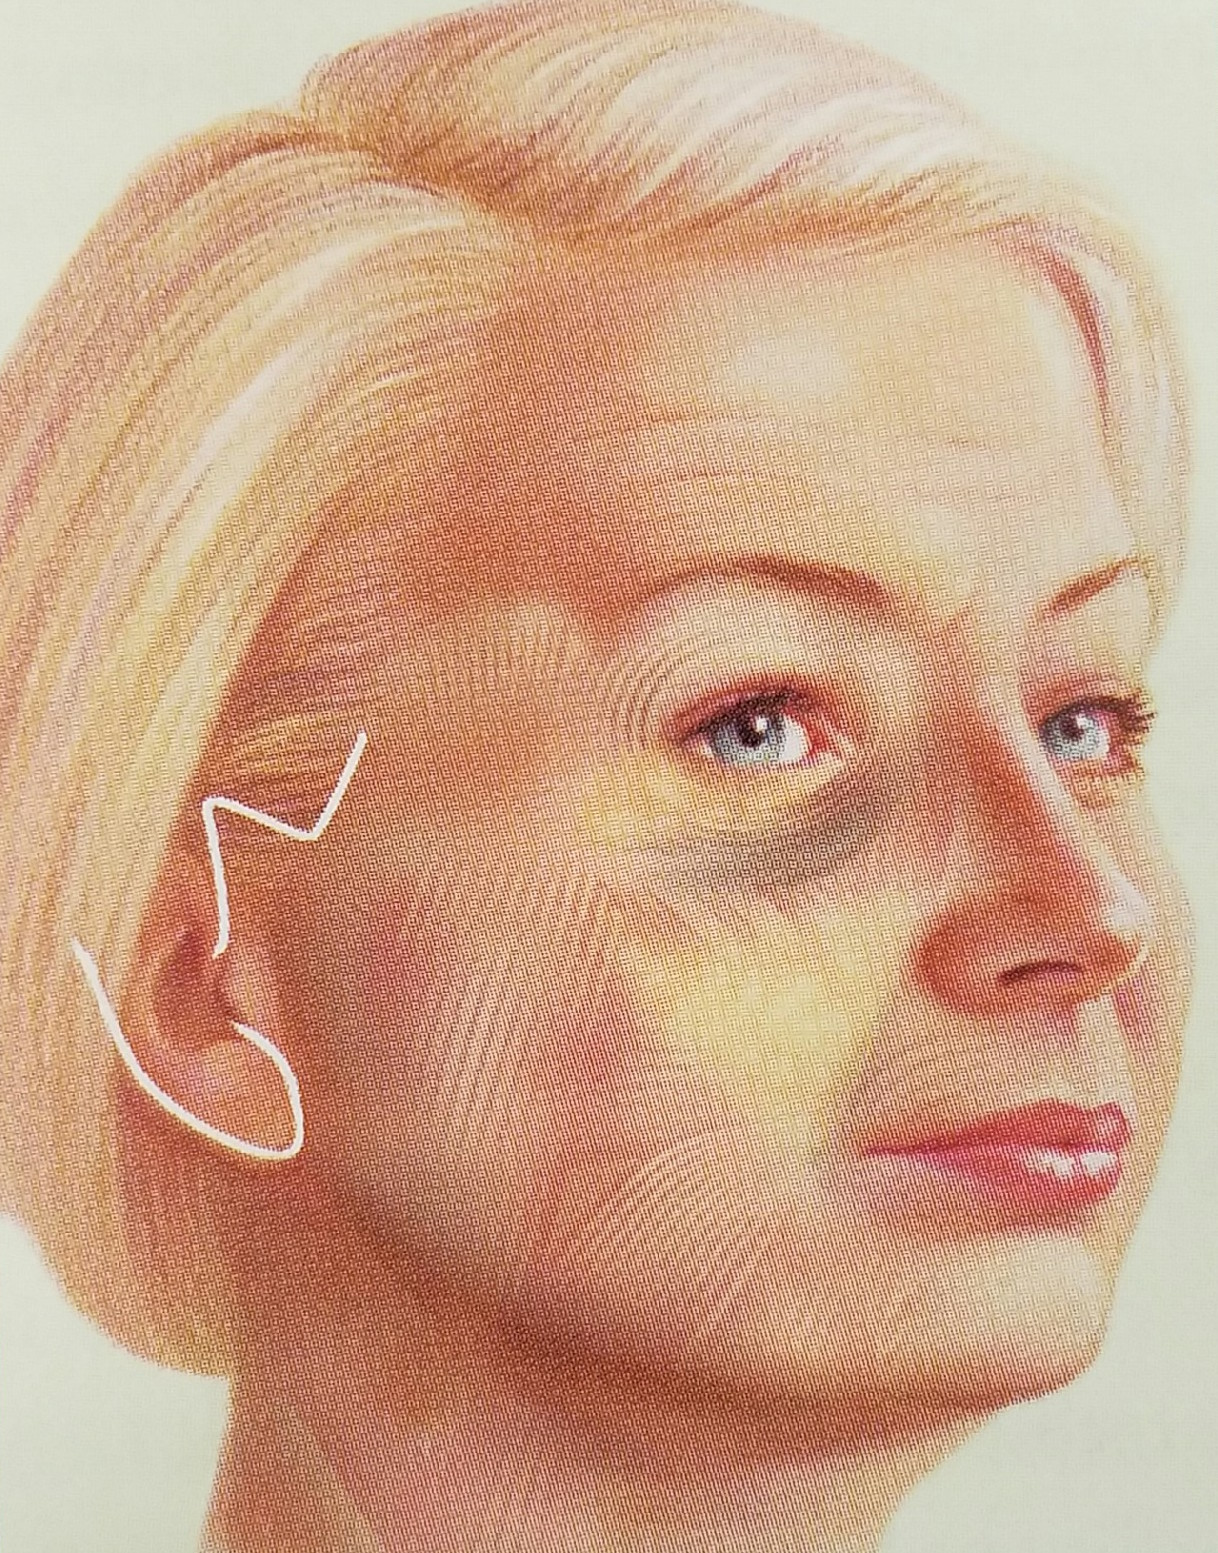 Face Procedures Cosmetic Reconstructive Surgery